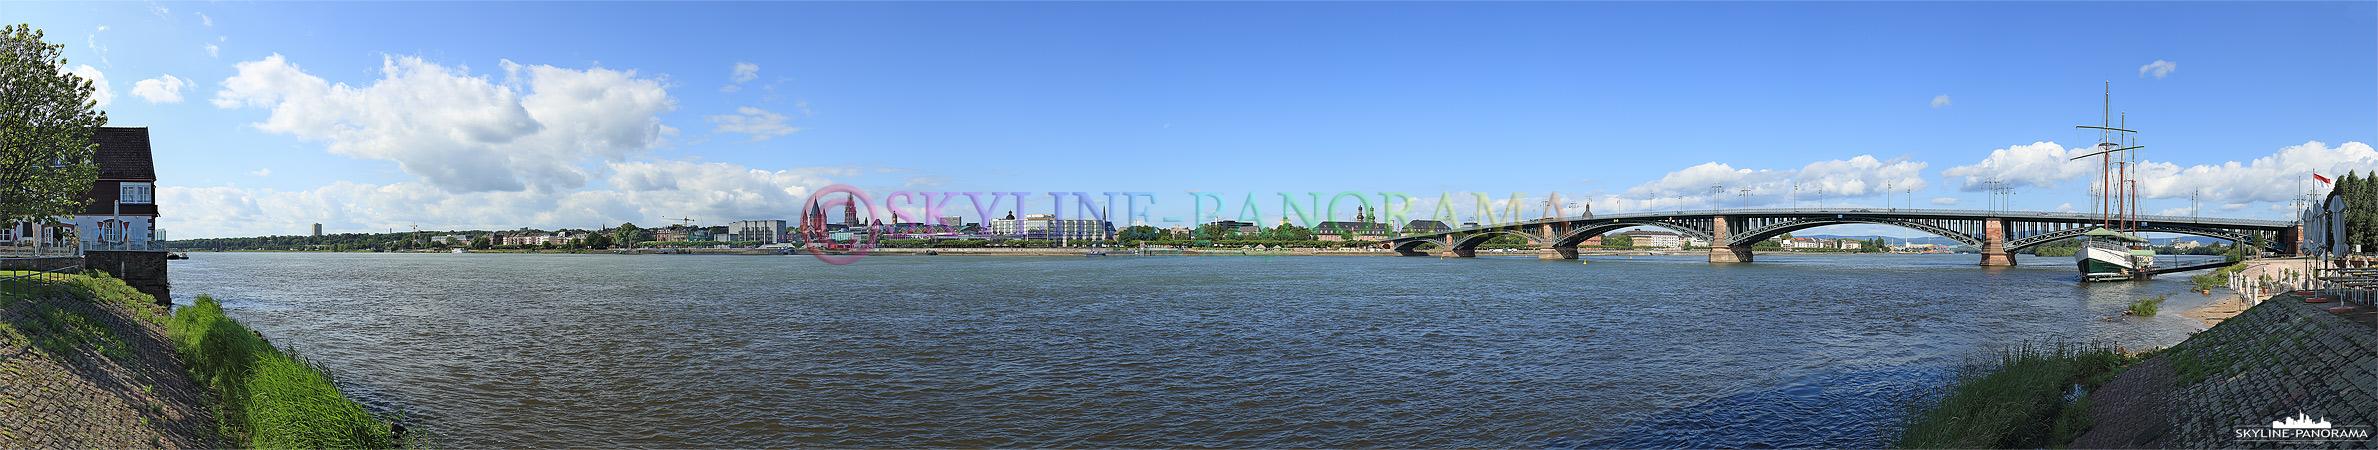 Skyline Mainz - Panorama Rheinufer